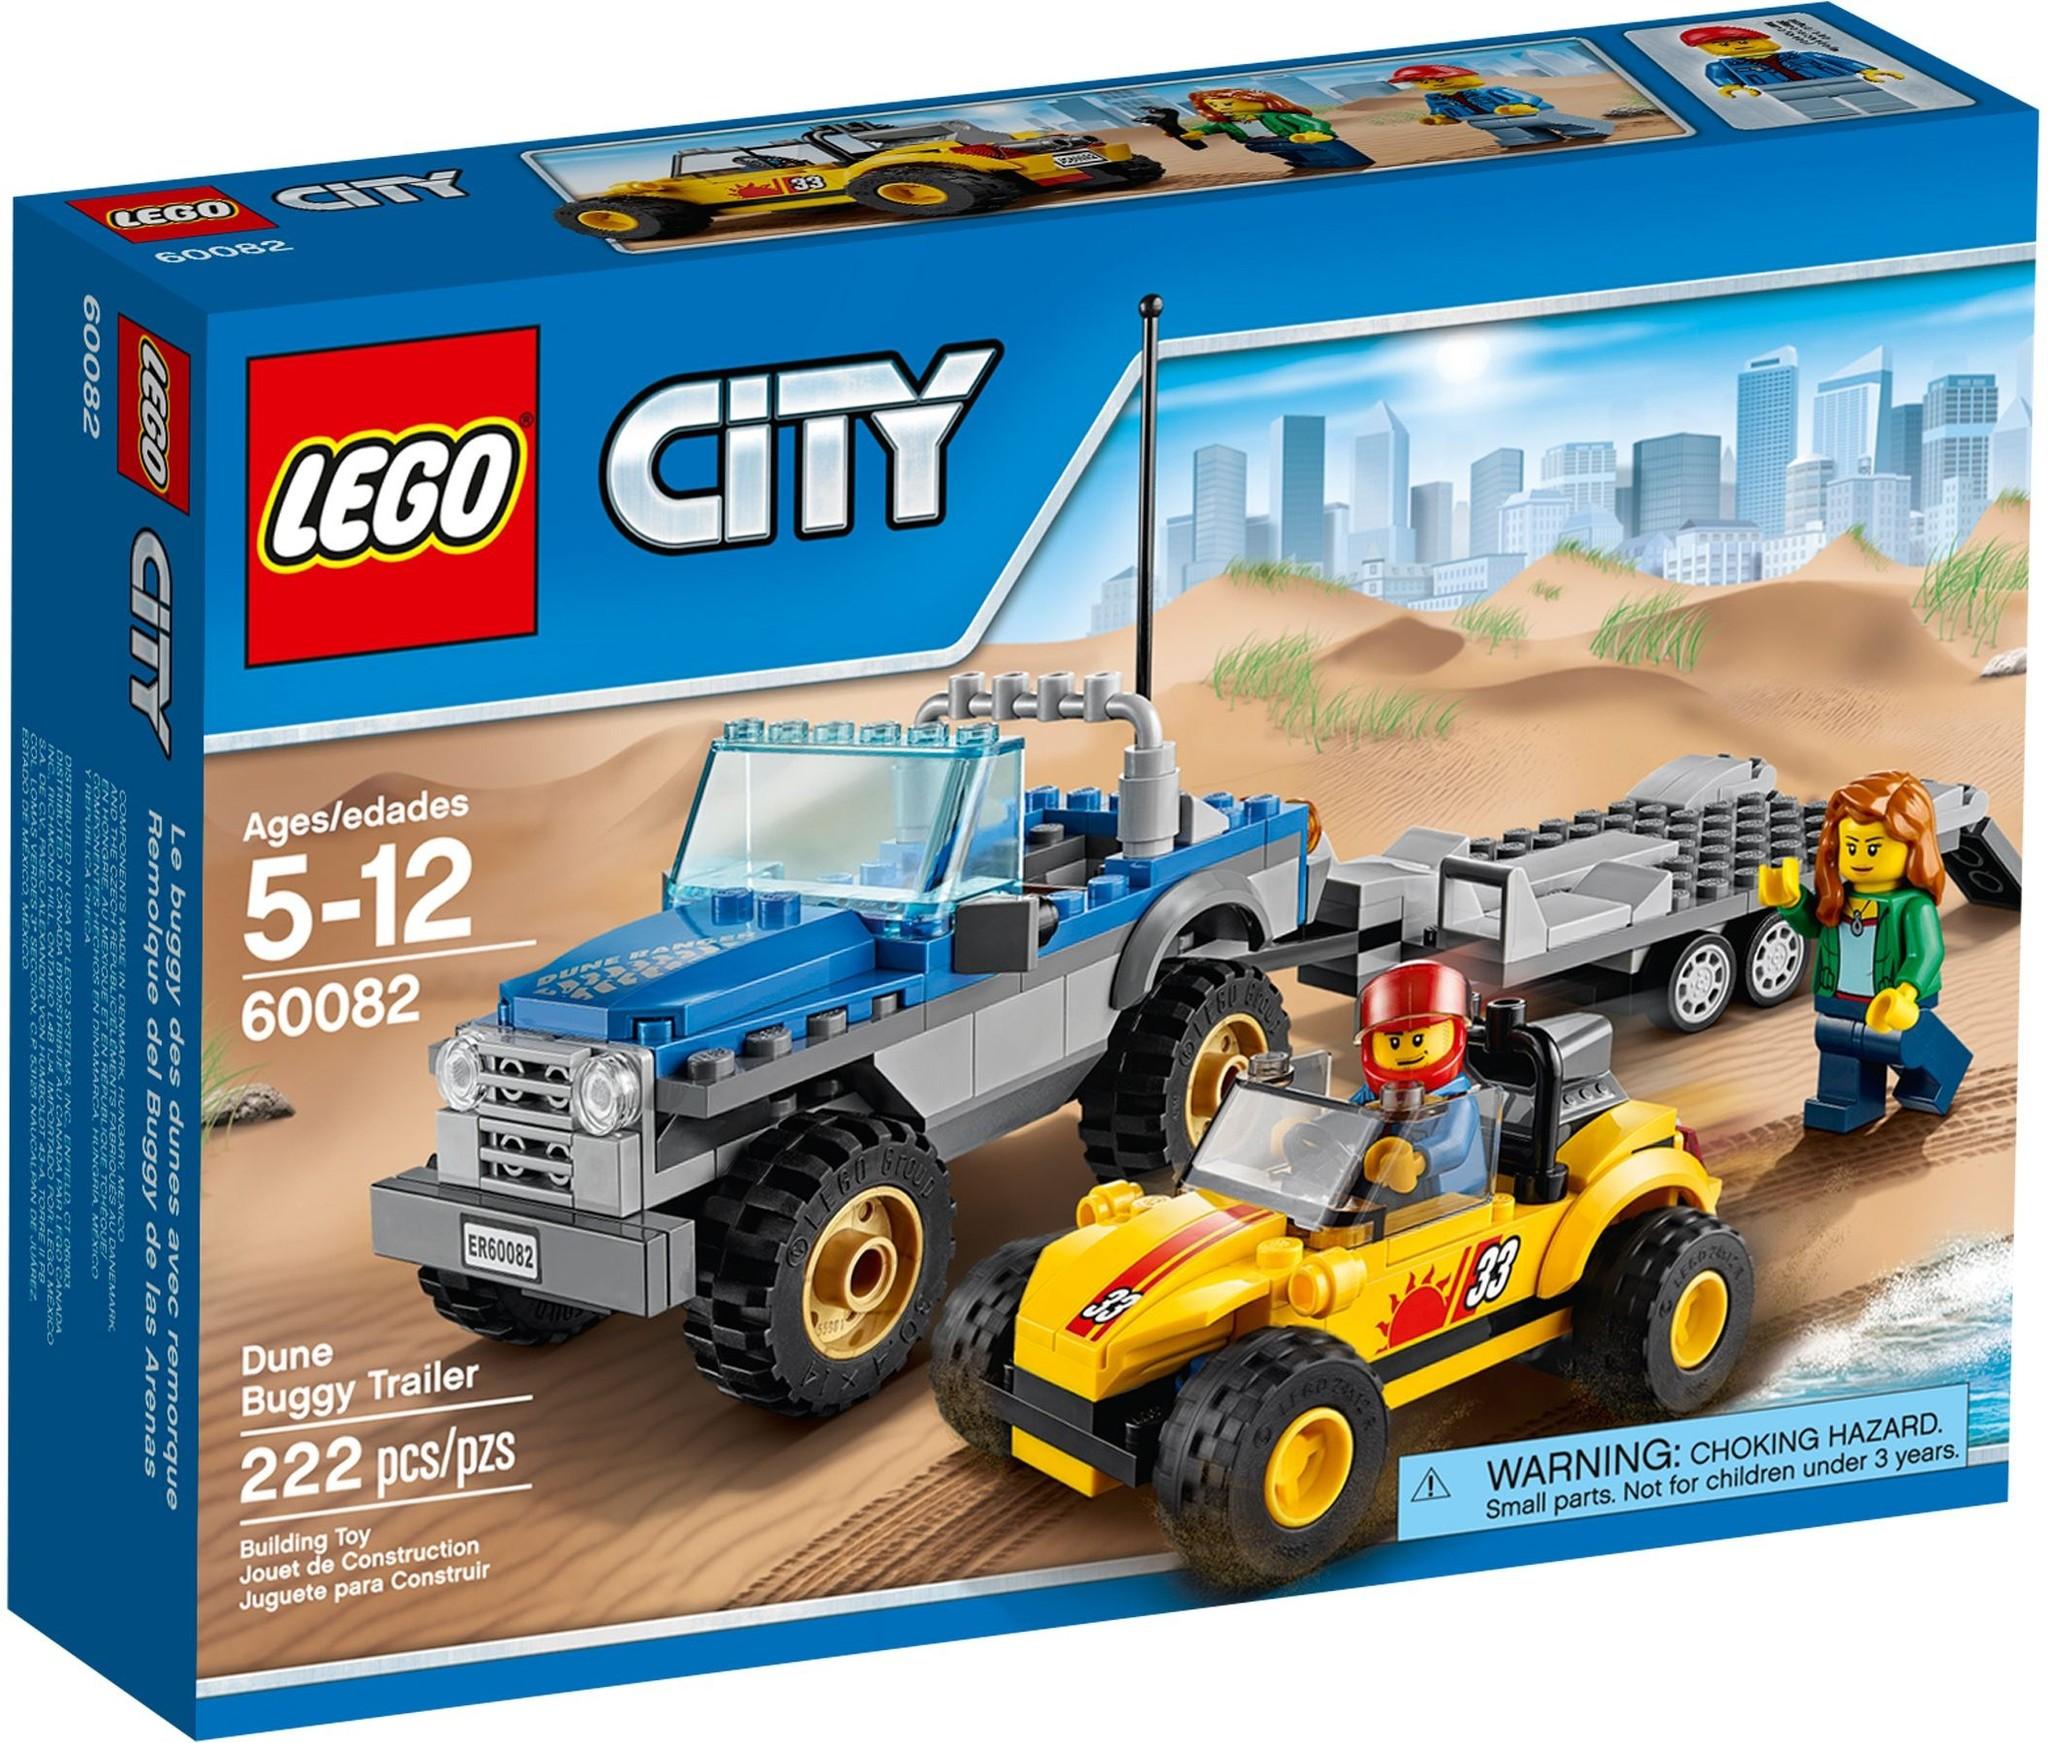 LEGO 60082 - City - Dune Buggy Trailer